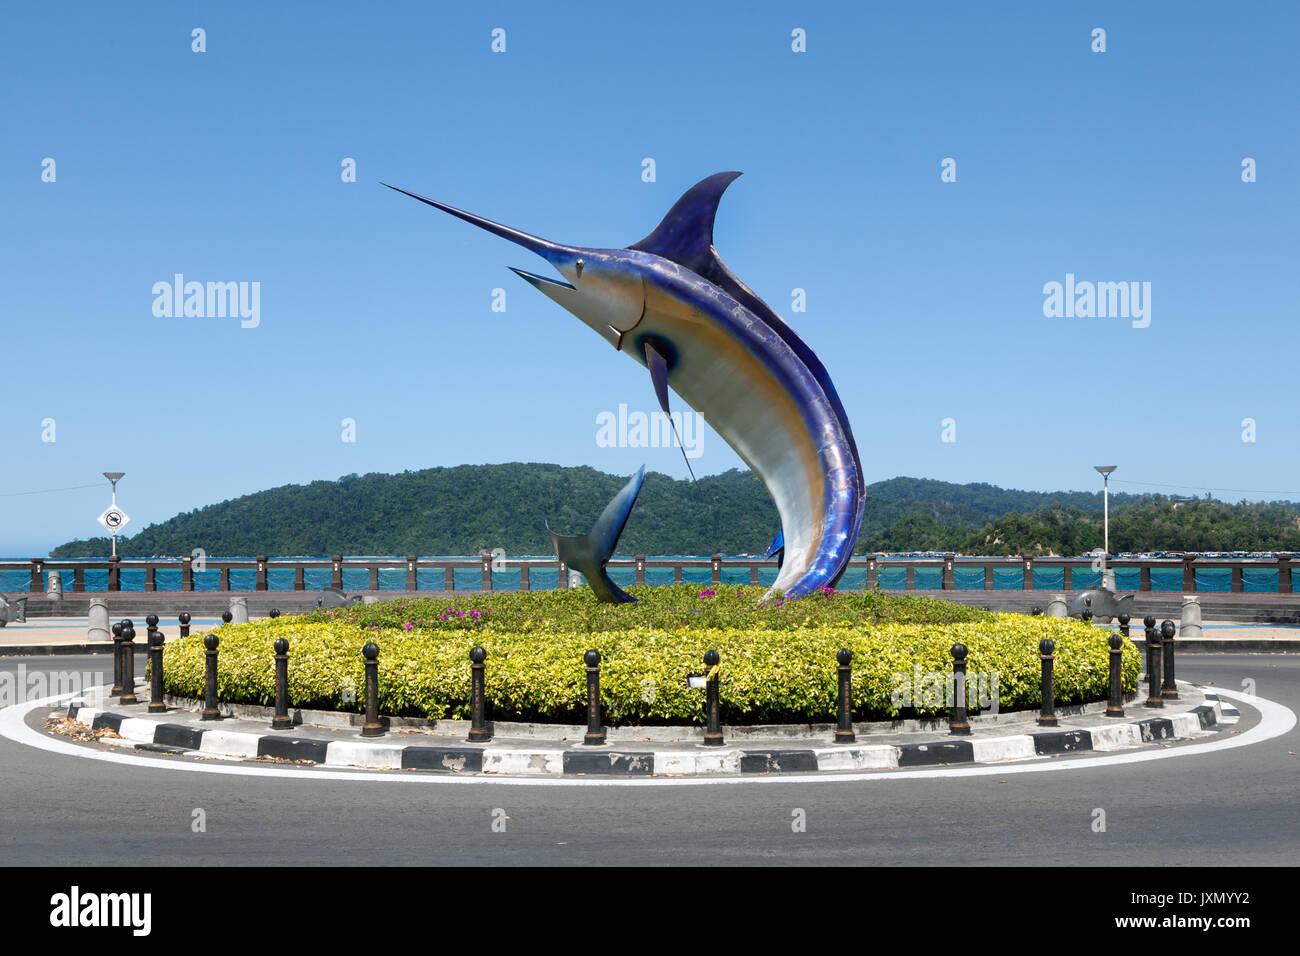 Giant marlin statue located on Kota Kinabalu seafront, Sabah, Borneo, Malaysia - Stock Image